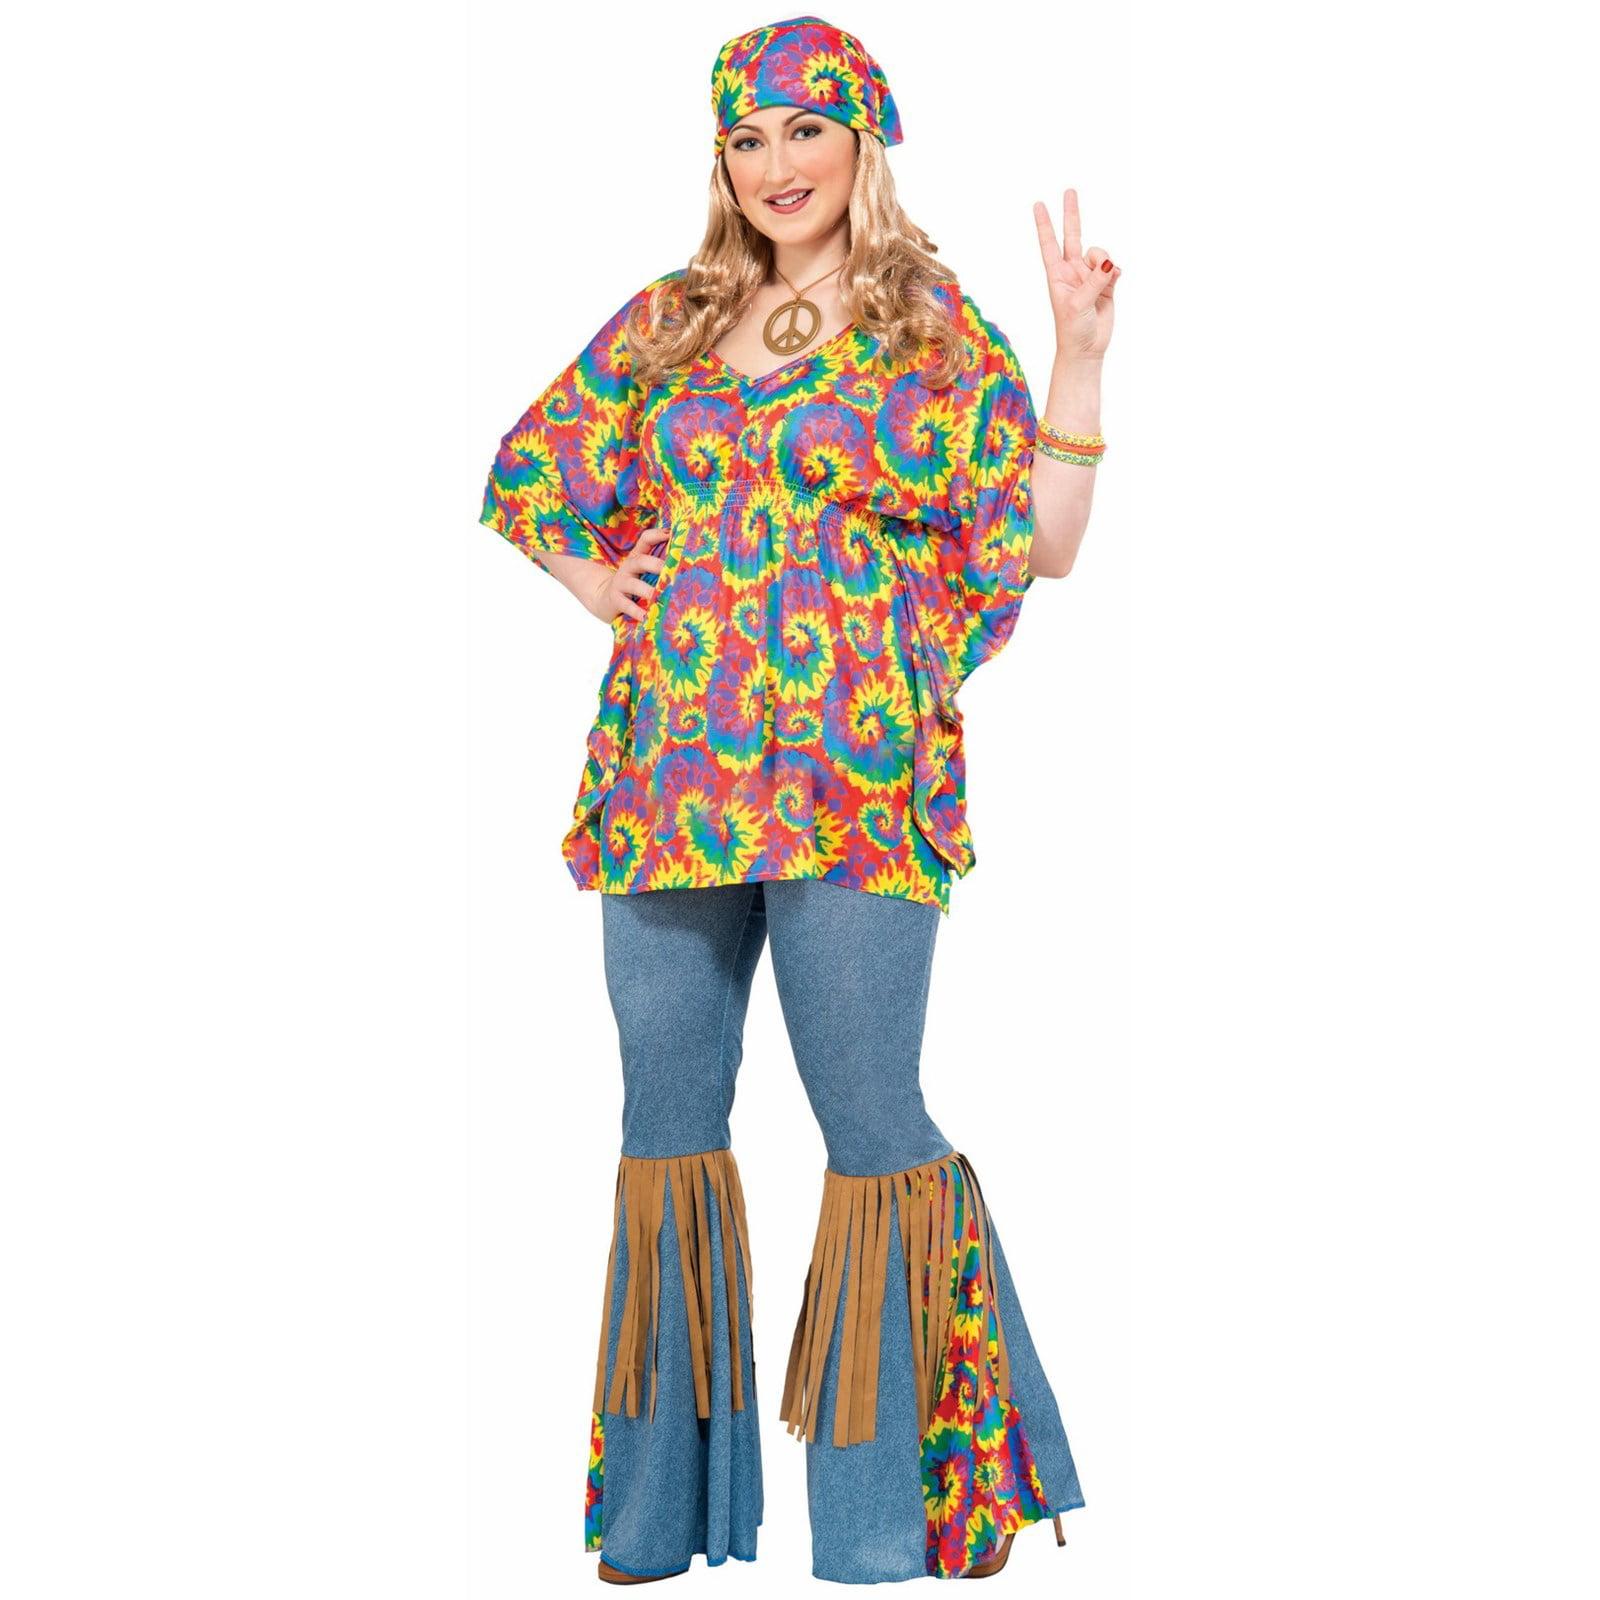 Hippie Girl Halloween Costume.Halloween Hippie Chick Plus Size Adult Costume